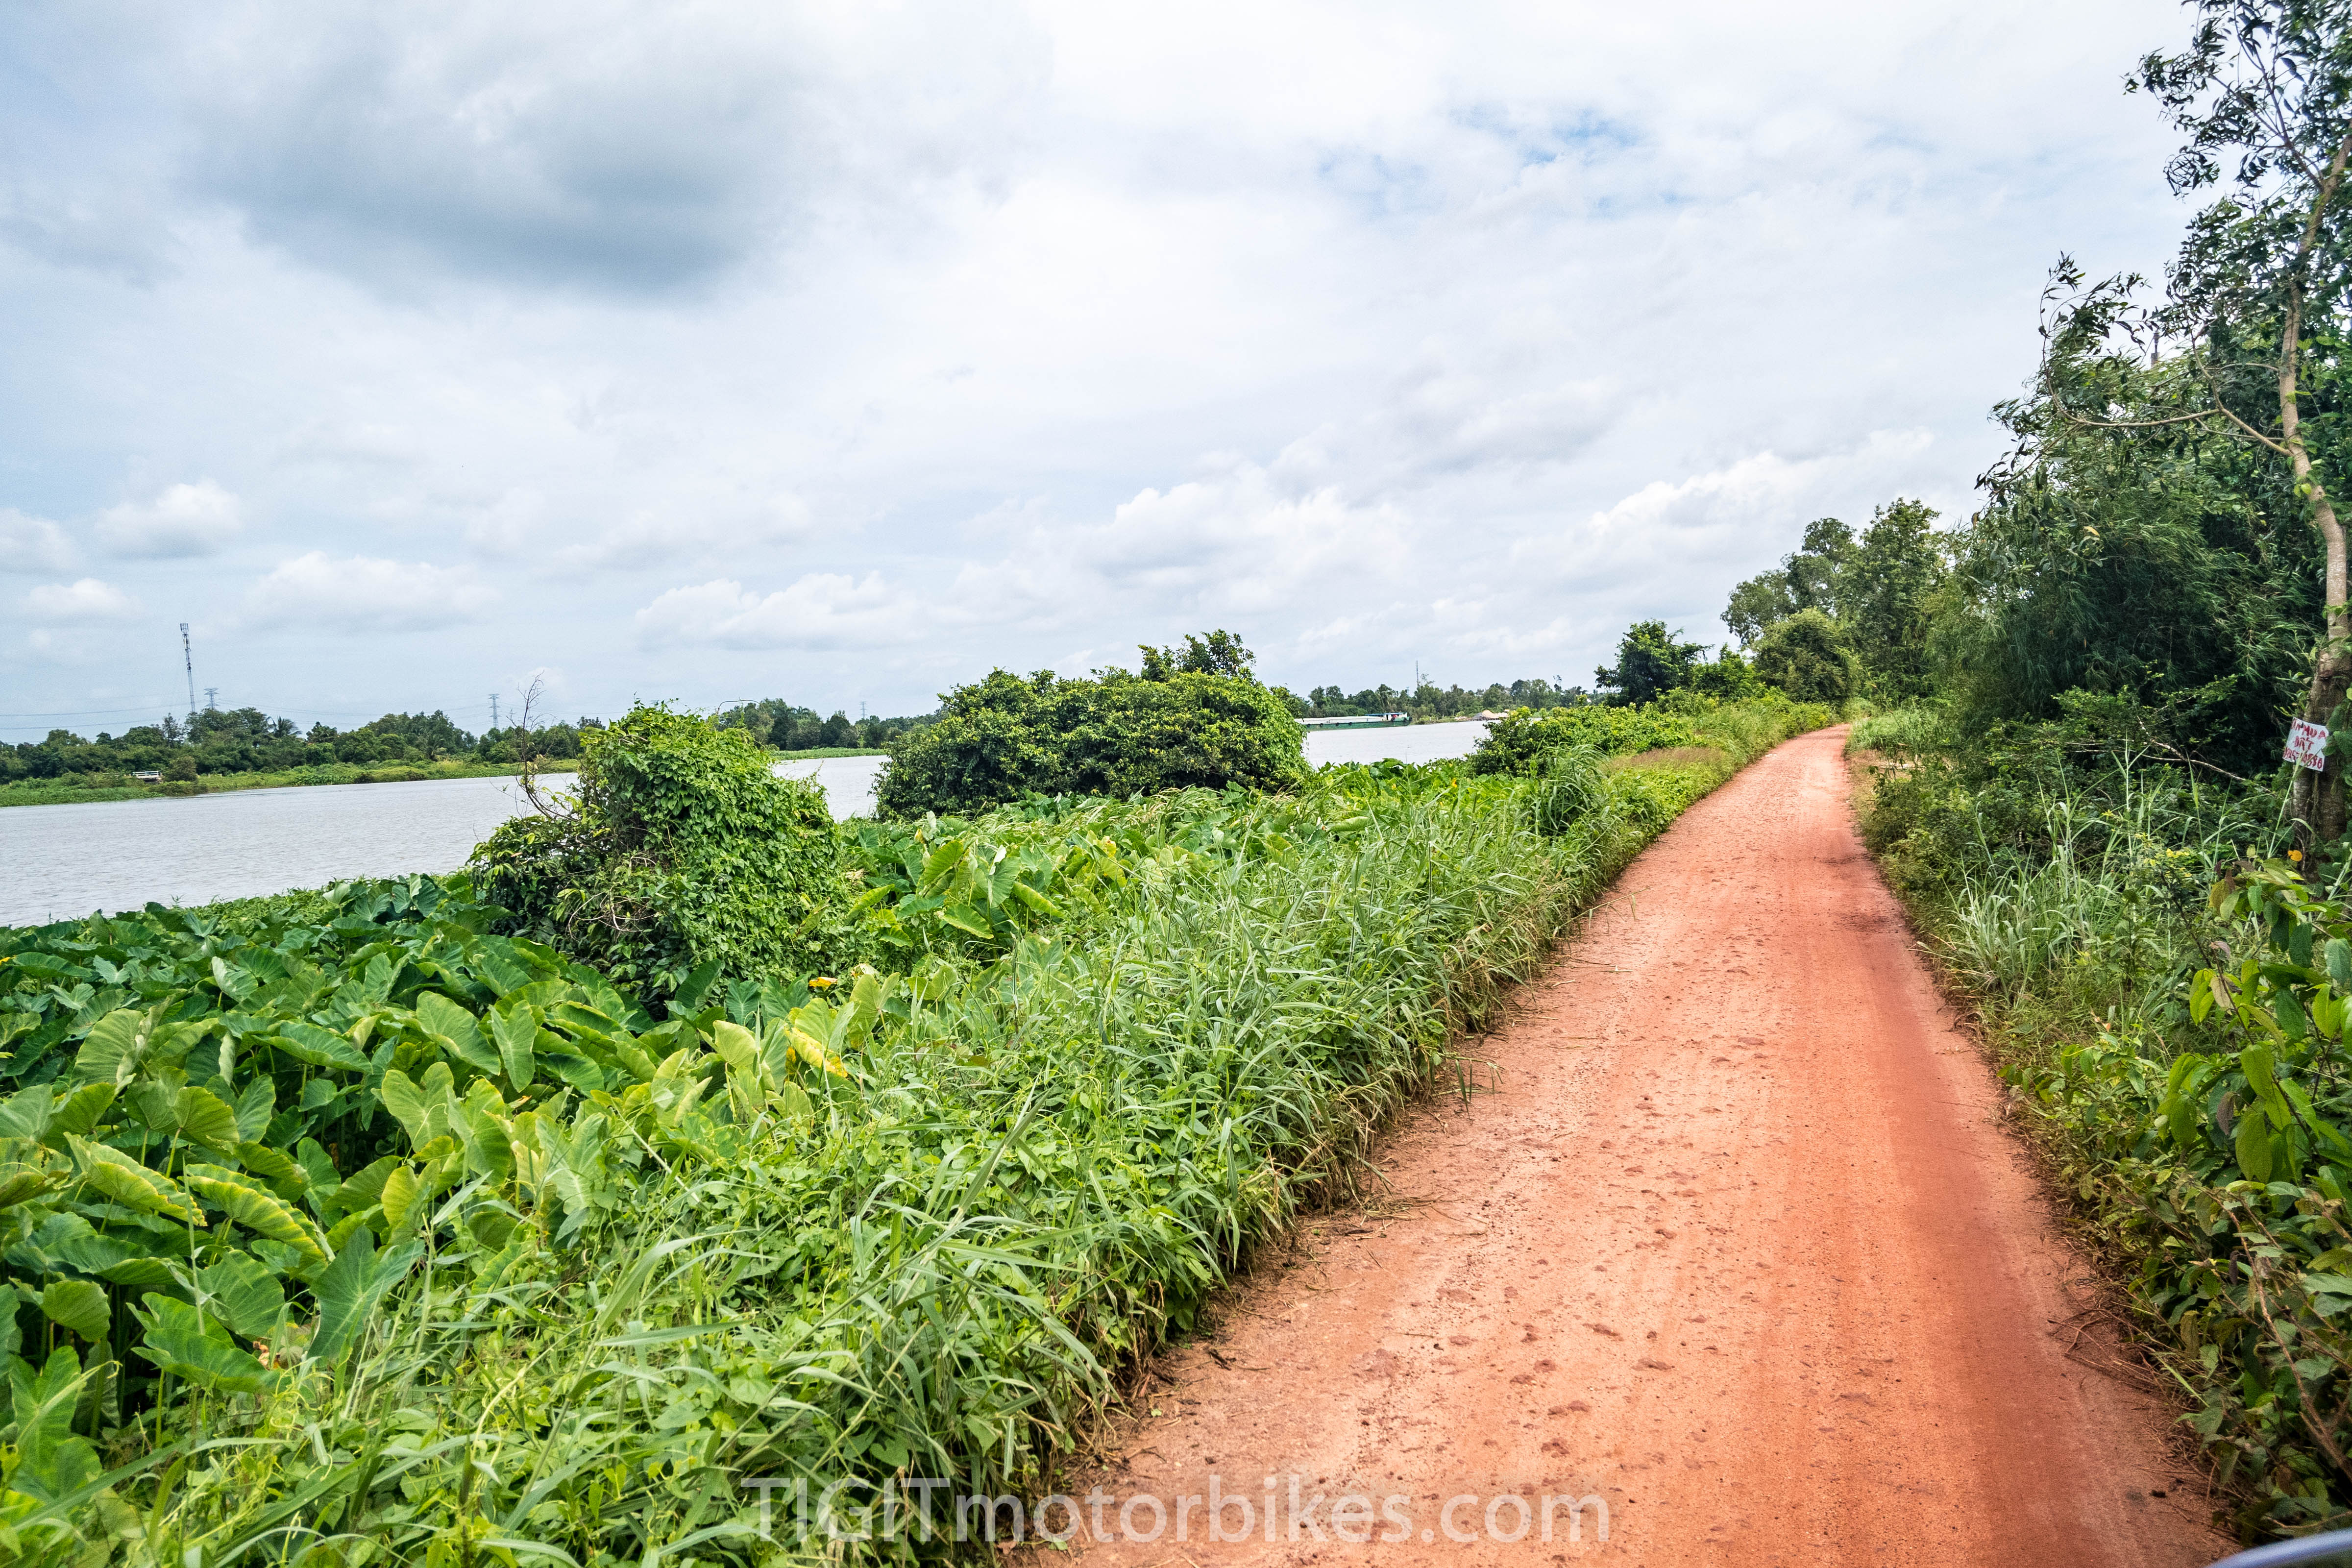 Mild clay backroad Vietnam